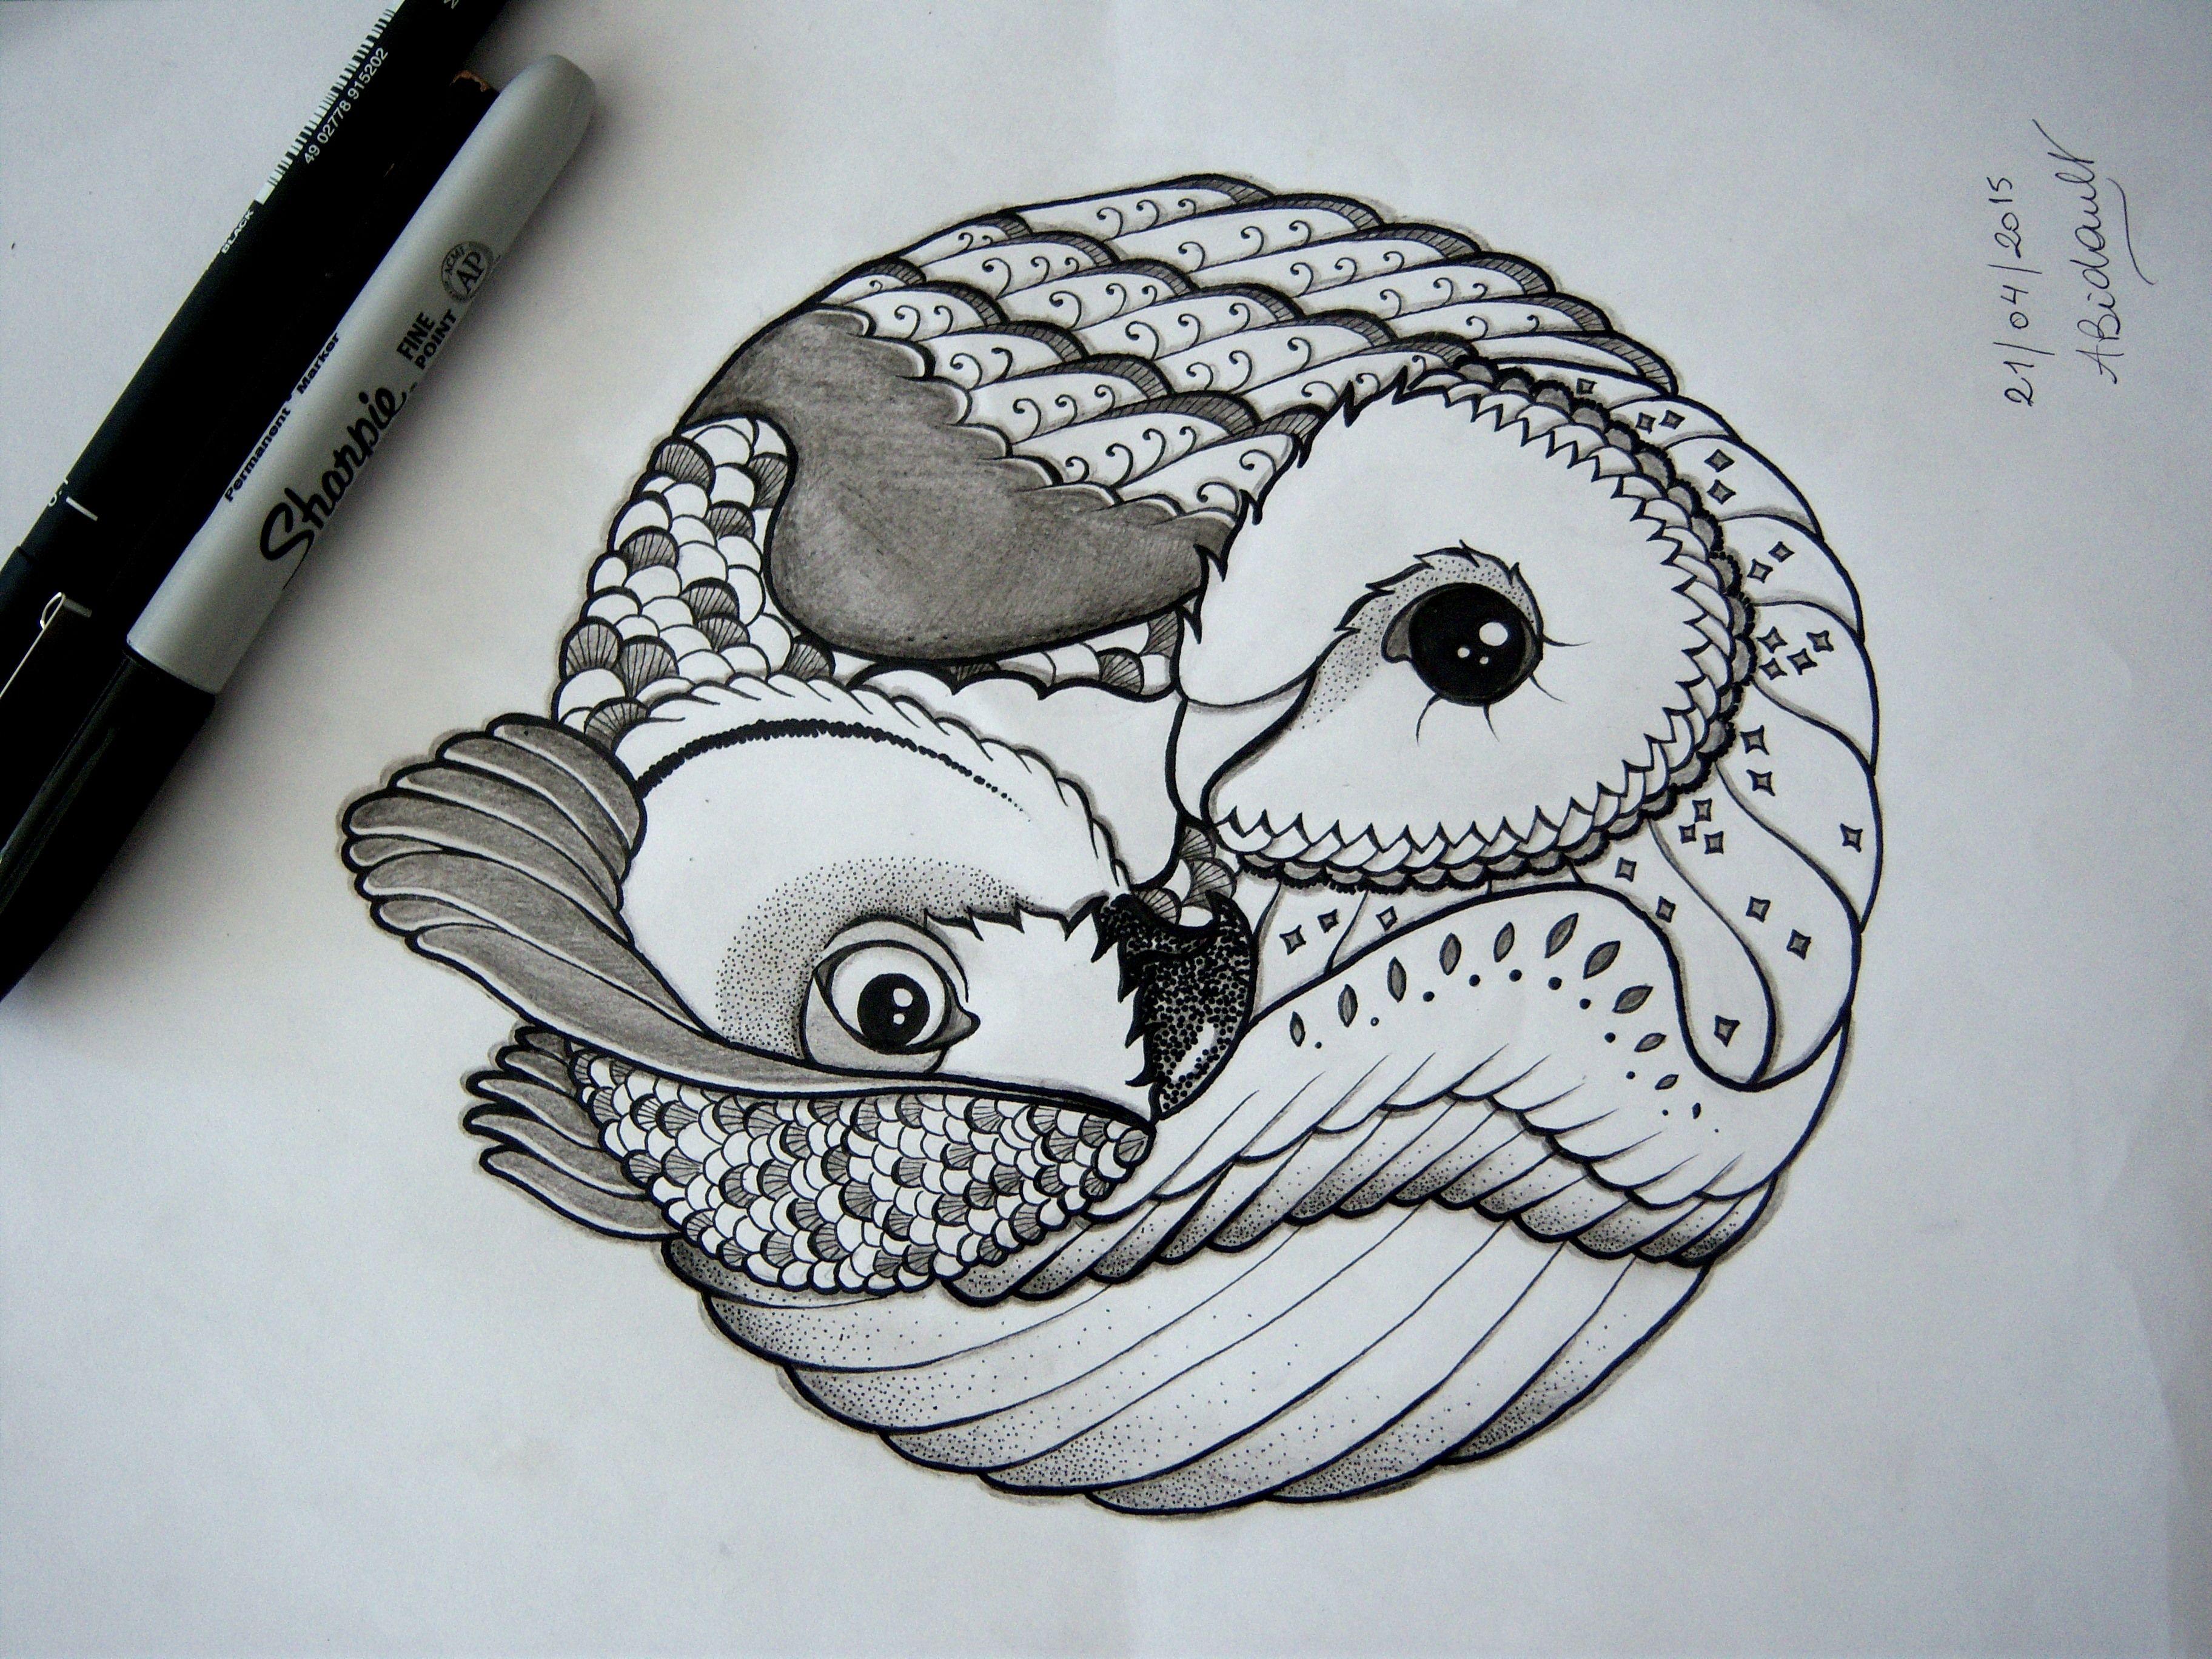 3648x2736 Owl Yin Amp Yang Tattoo Design By An Bidault